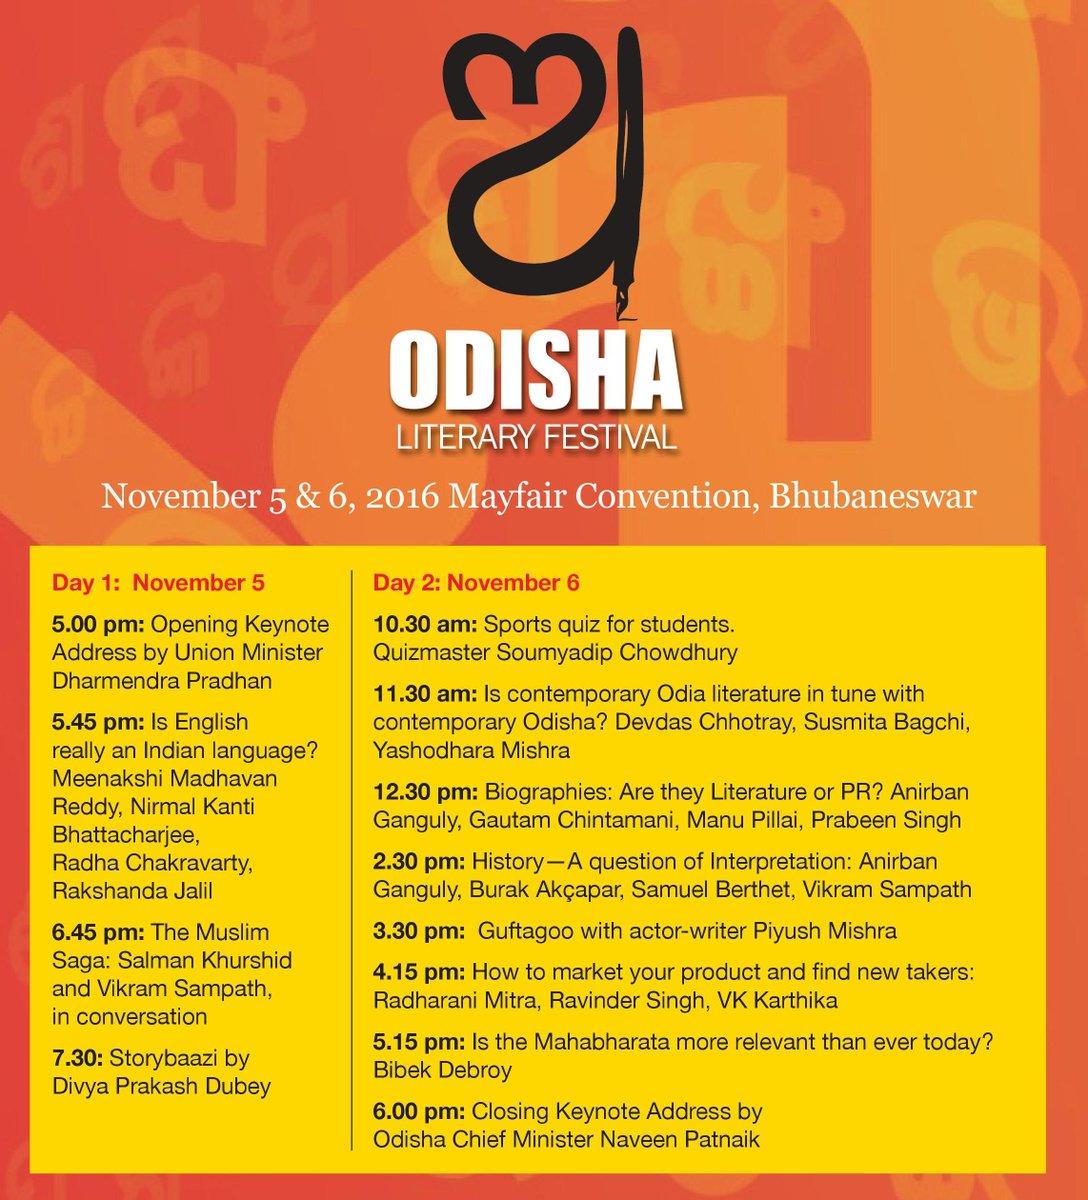 odisha literary festival 2016 schedule